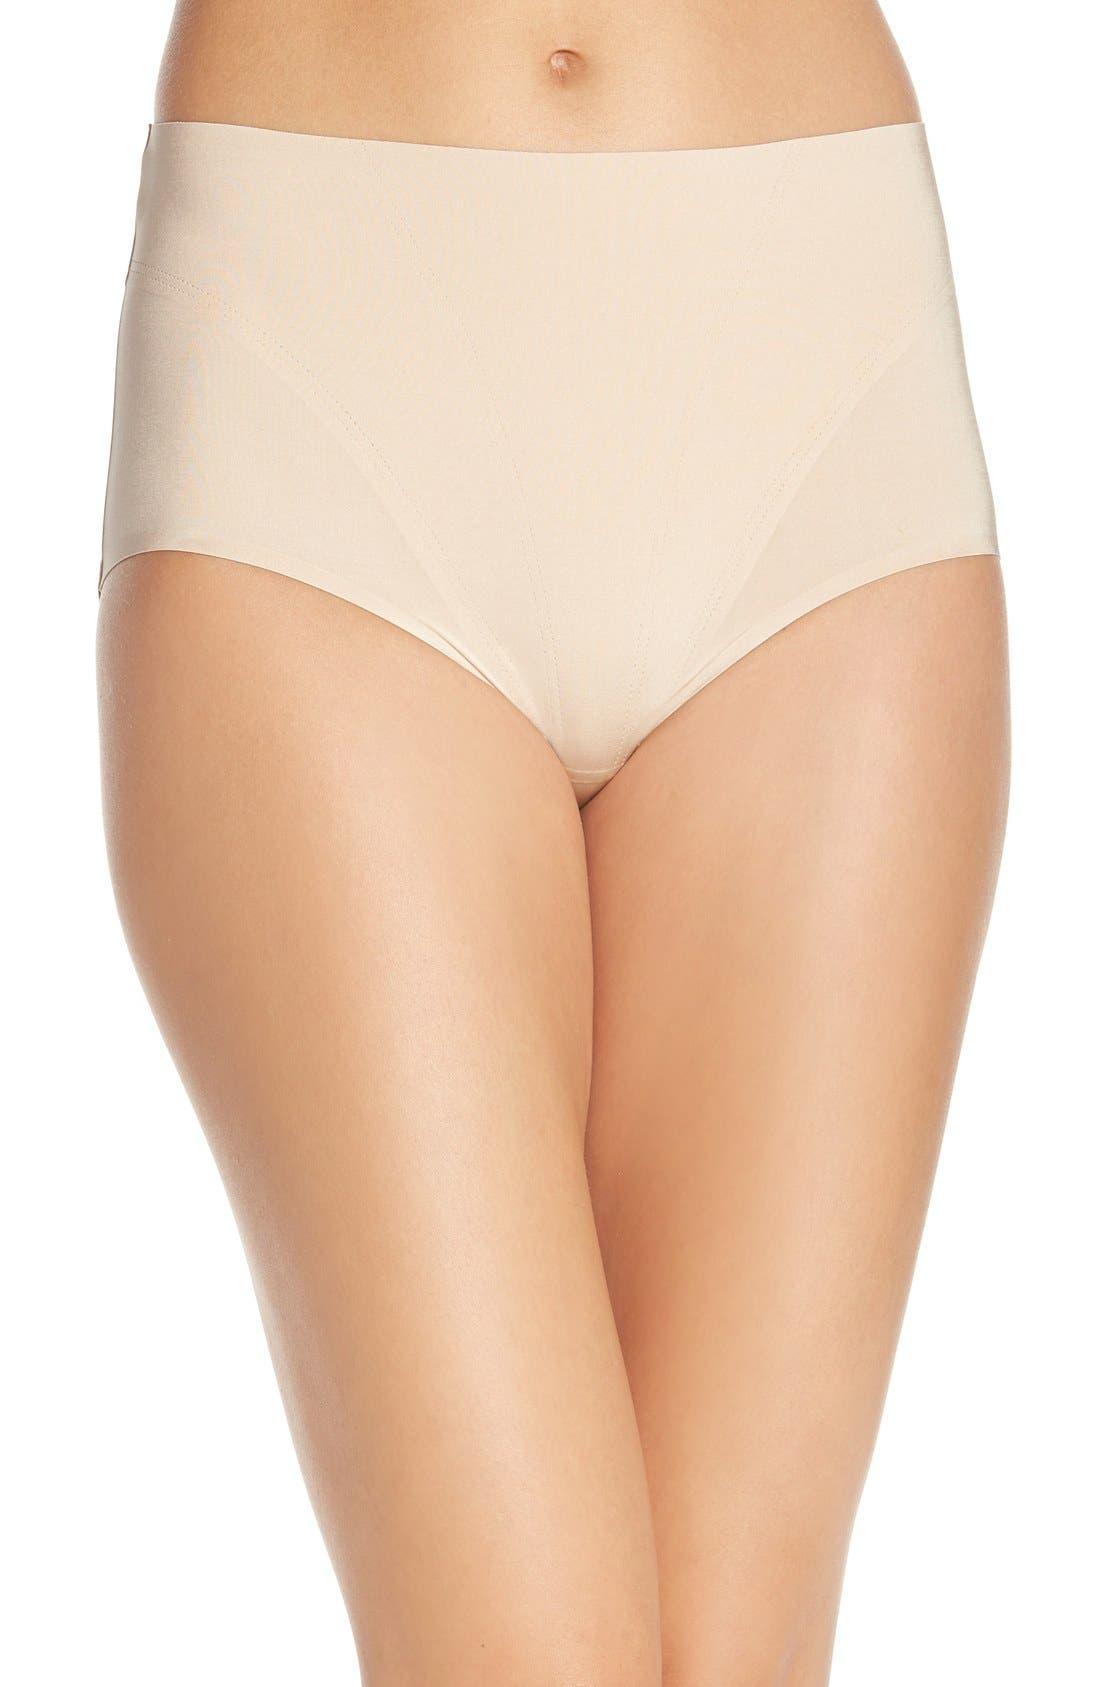 Retro Shaping Panties,                         Main,                         color, 270